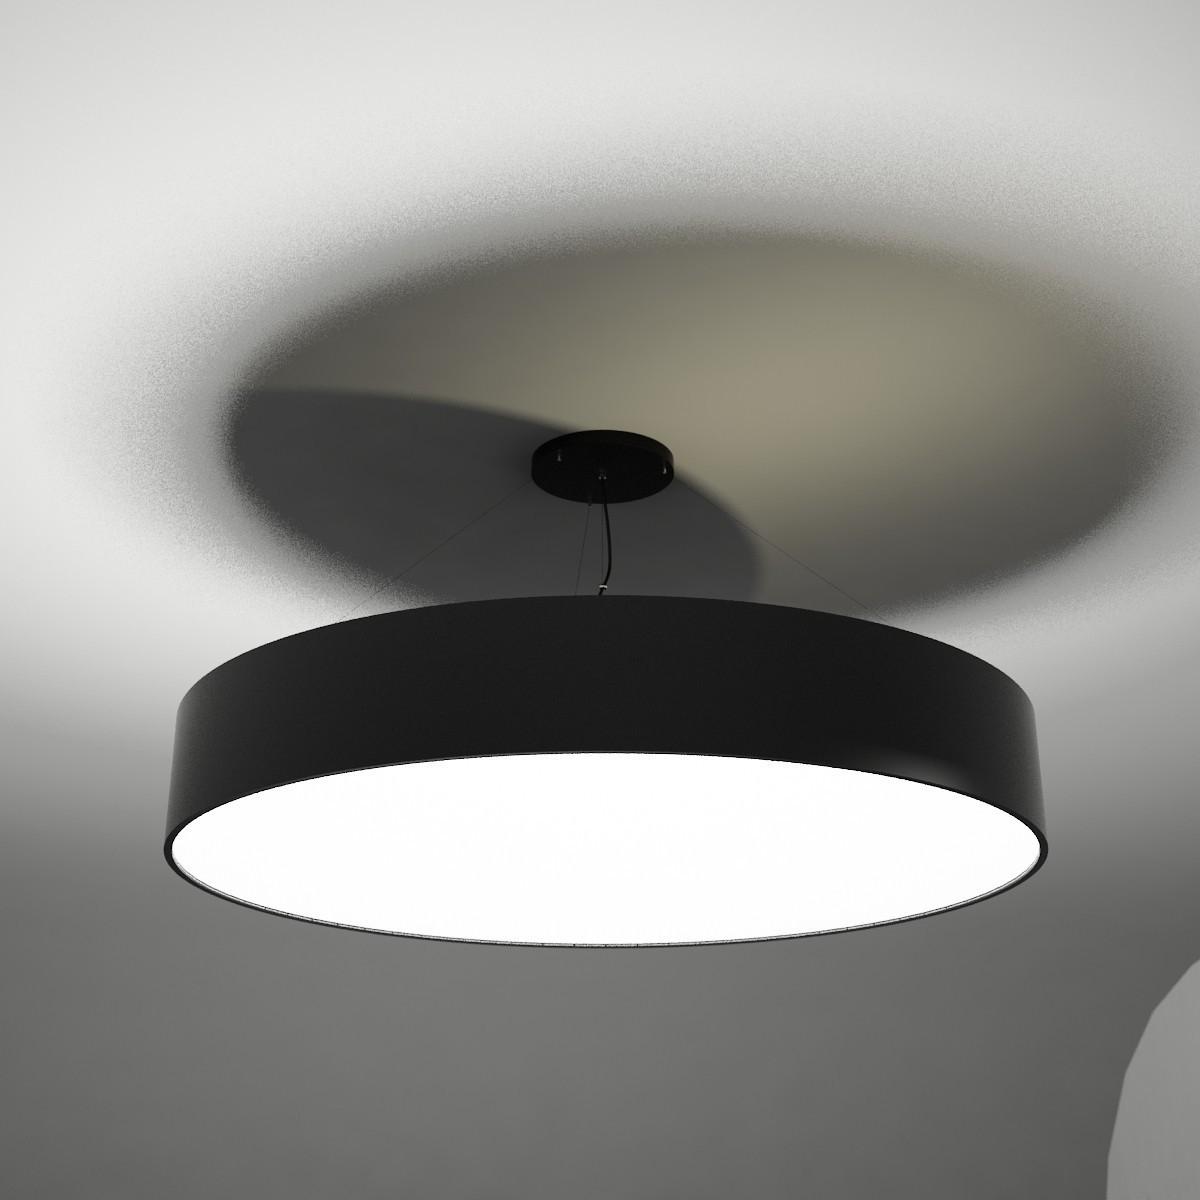 Shilo Lampa wisząca BUNGO 520 kolor do wyboru 5520-B/E27/Kolor